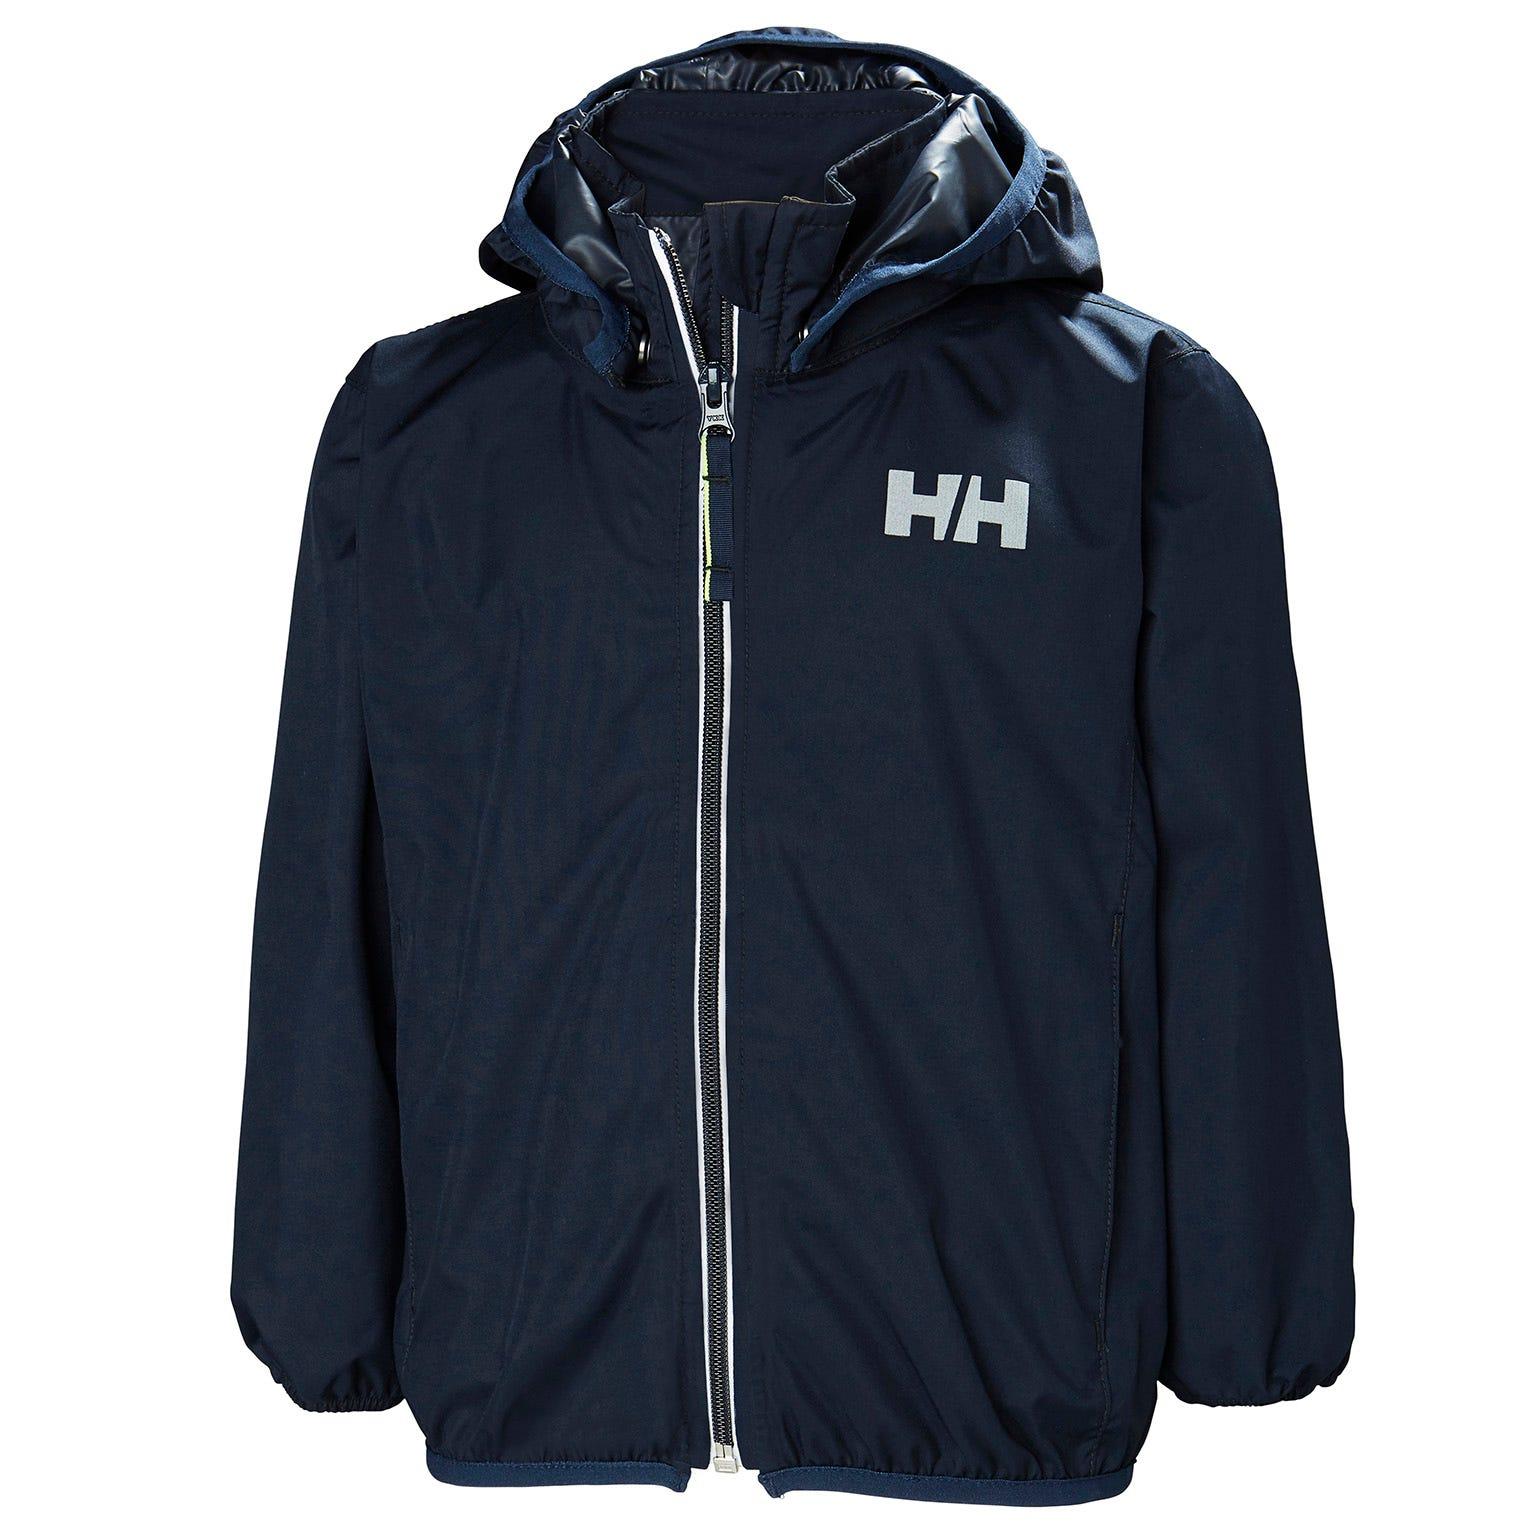 Helly Hansen Kids Helium Packable Jacket Parka Navy 86/1